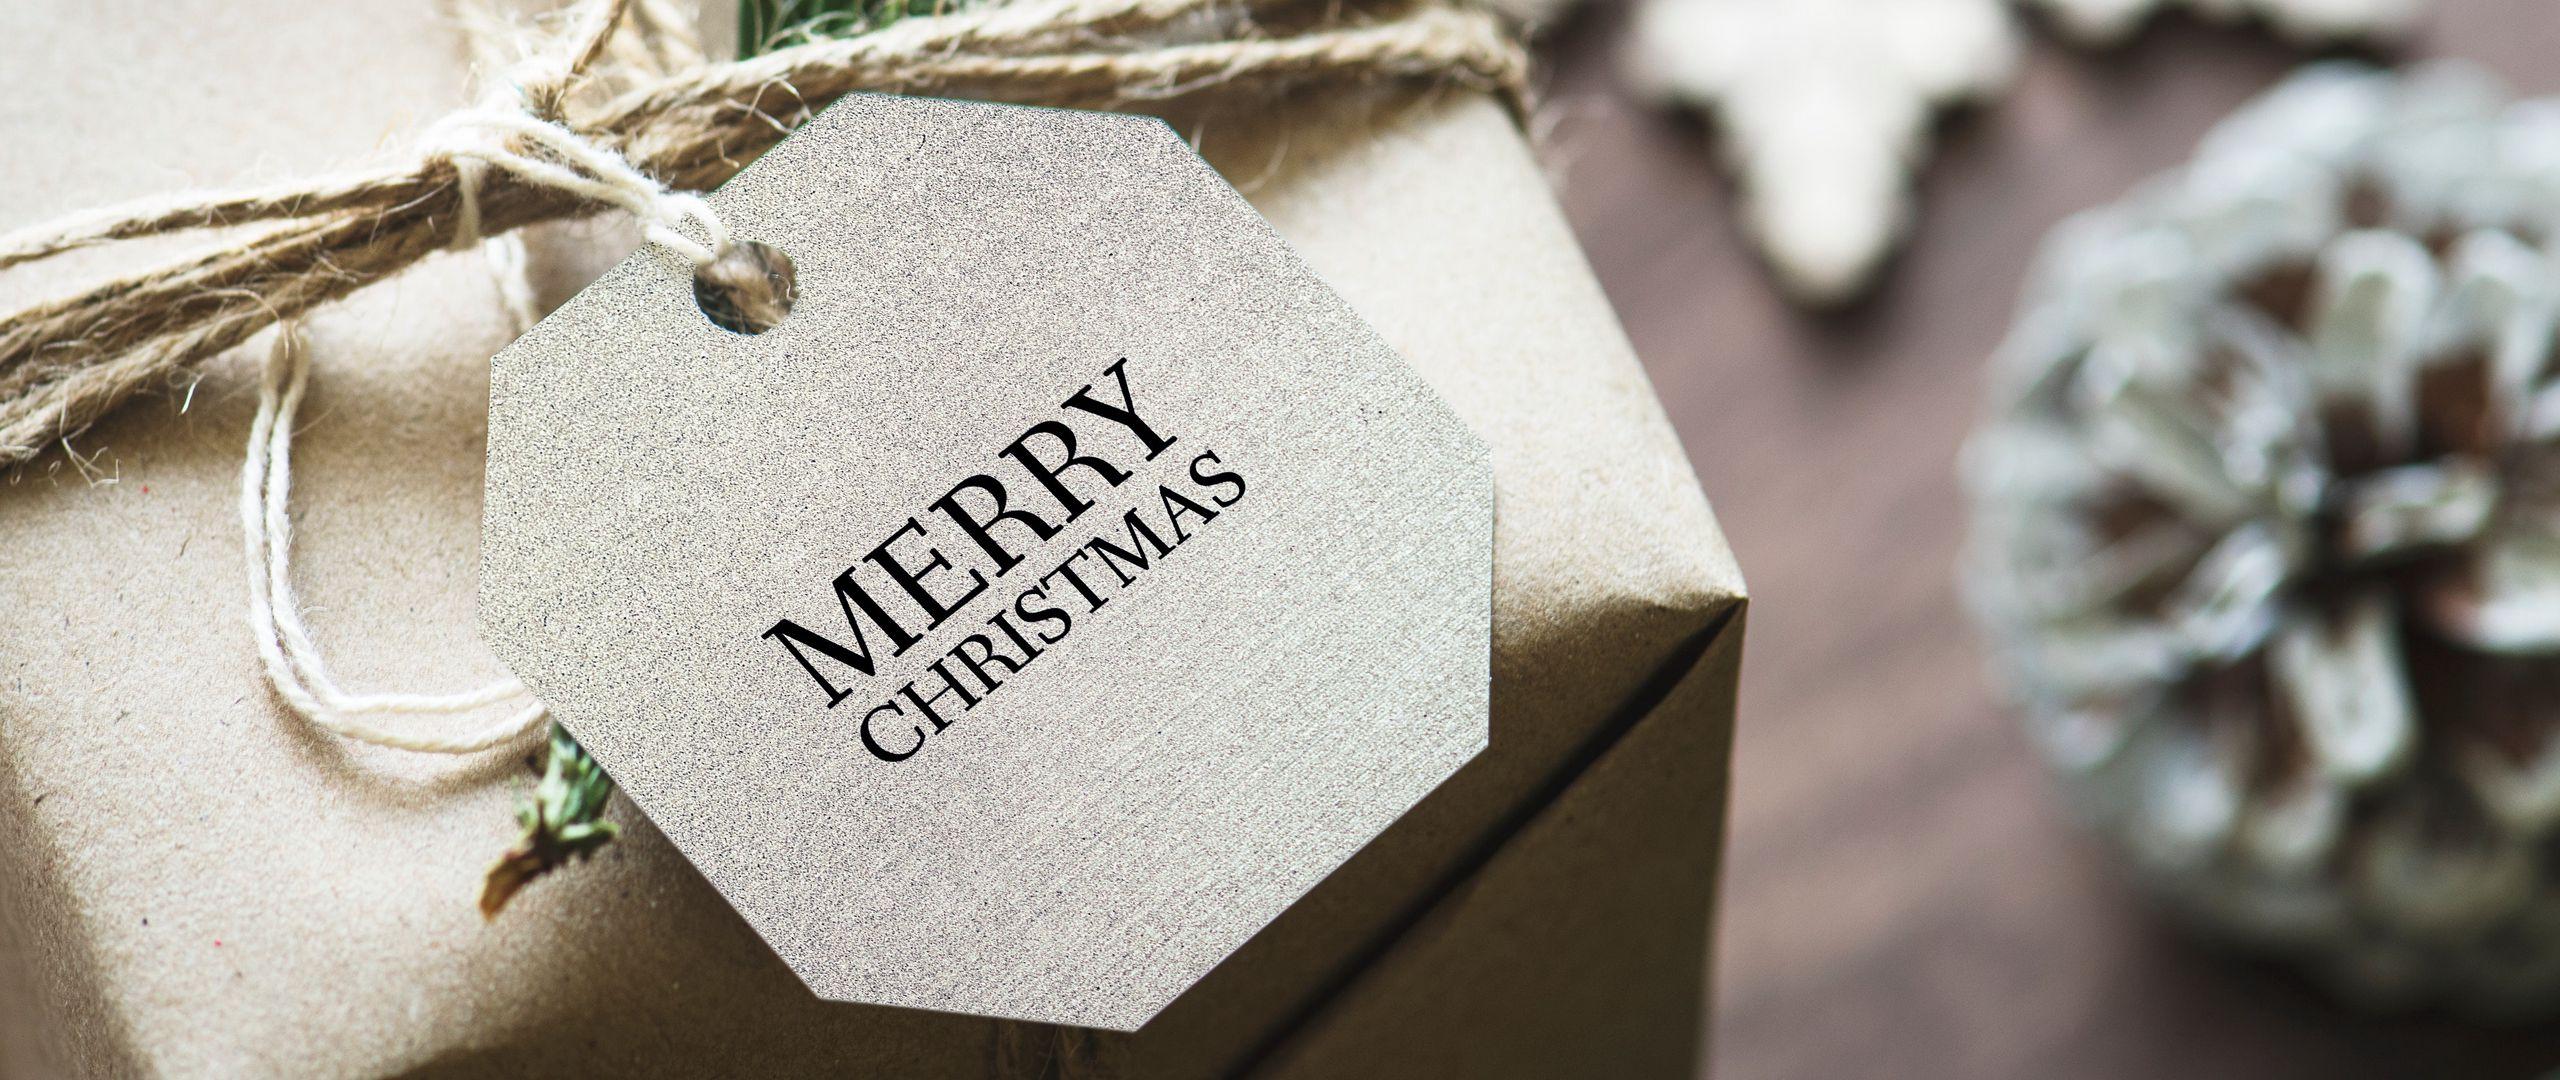 2560x1080 Wallpaper gift, christmas, new year, tag, box